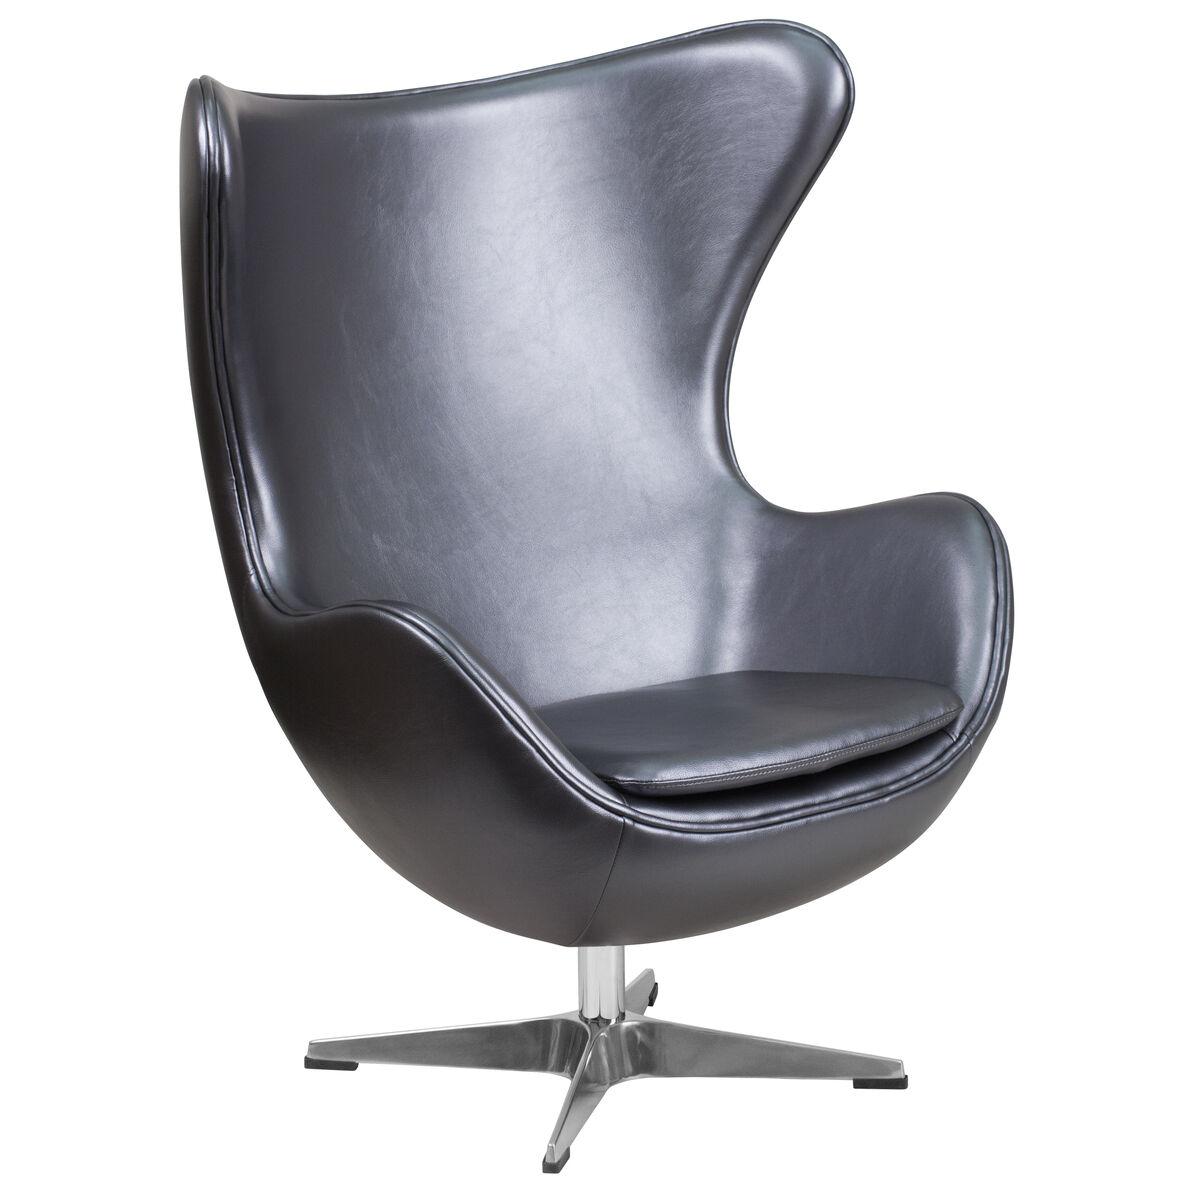 Surprising Gray Leather Egg Chair With Tilt Lock Mechanism Ibusinesslaw Wood Chair Design Ideas Ibusinesslaworg